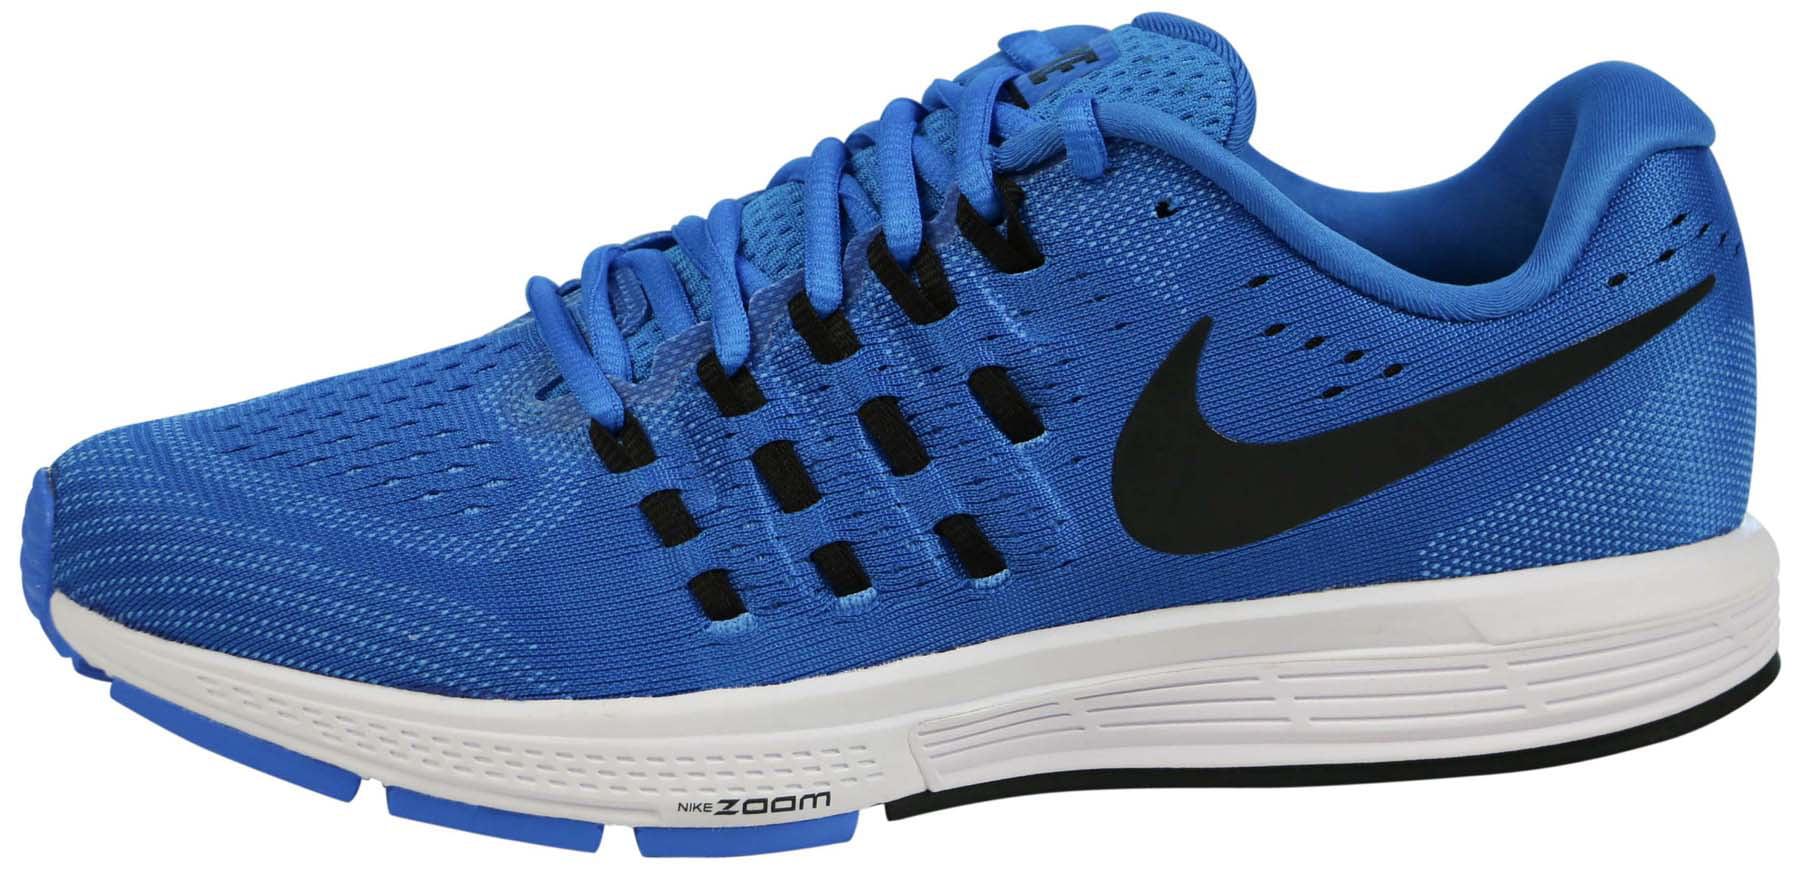 Nike Men's Air Zoom Vomero 11 Running Shoes-Photo Blue/Black